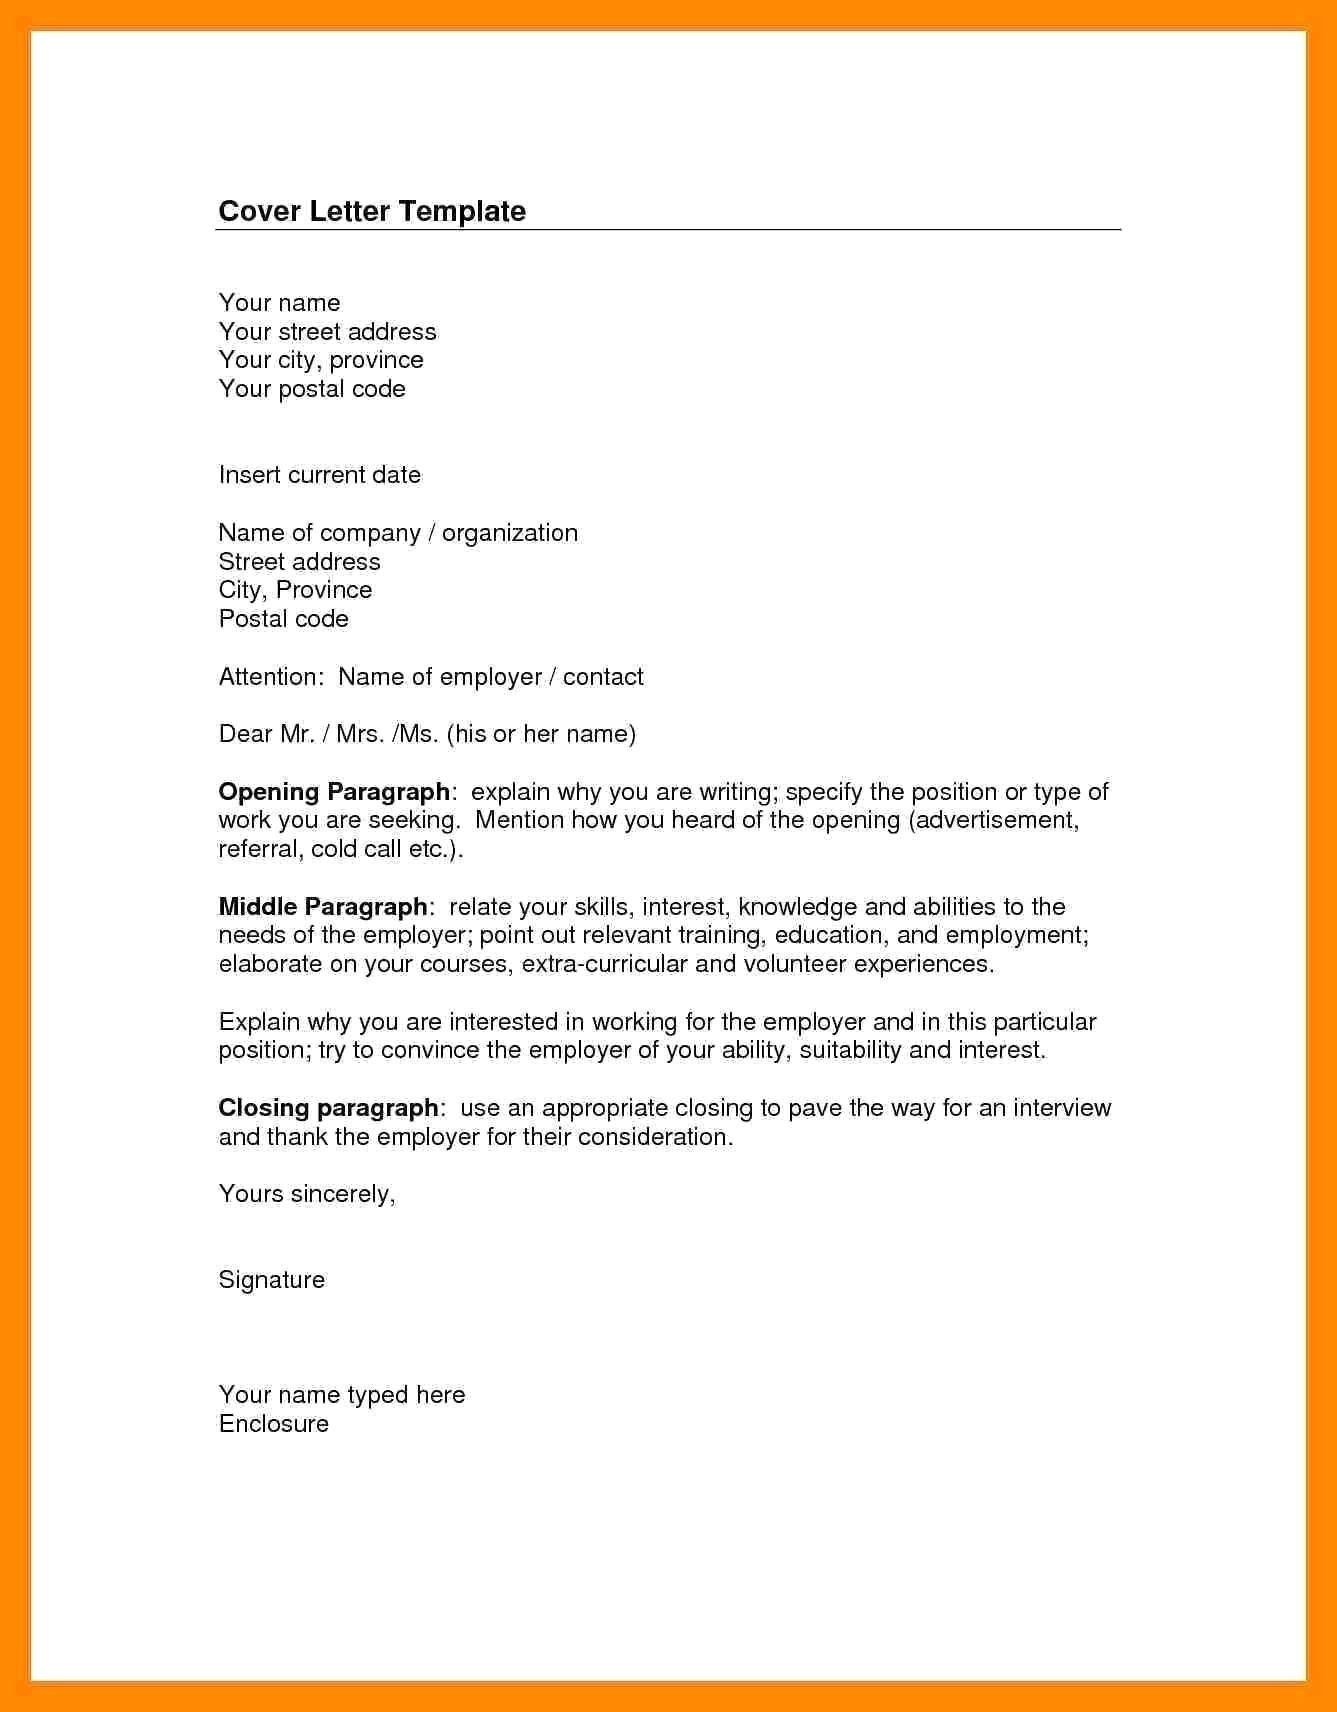 Resume Writing Companies Near Me